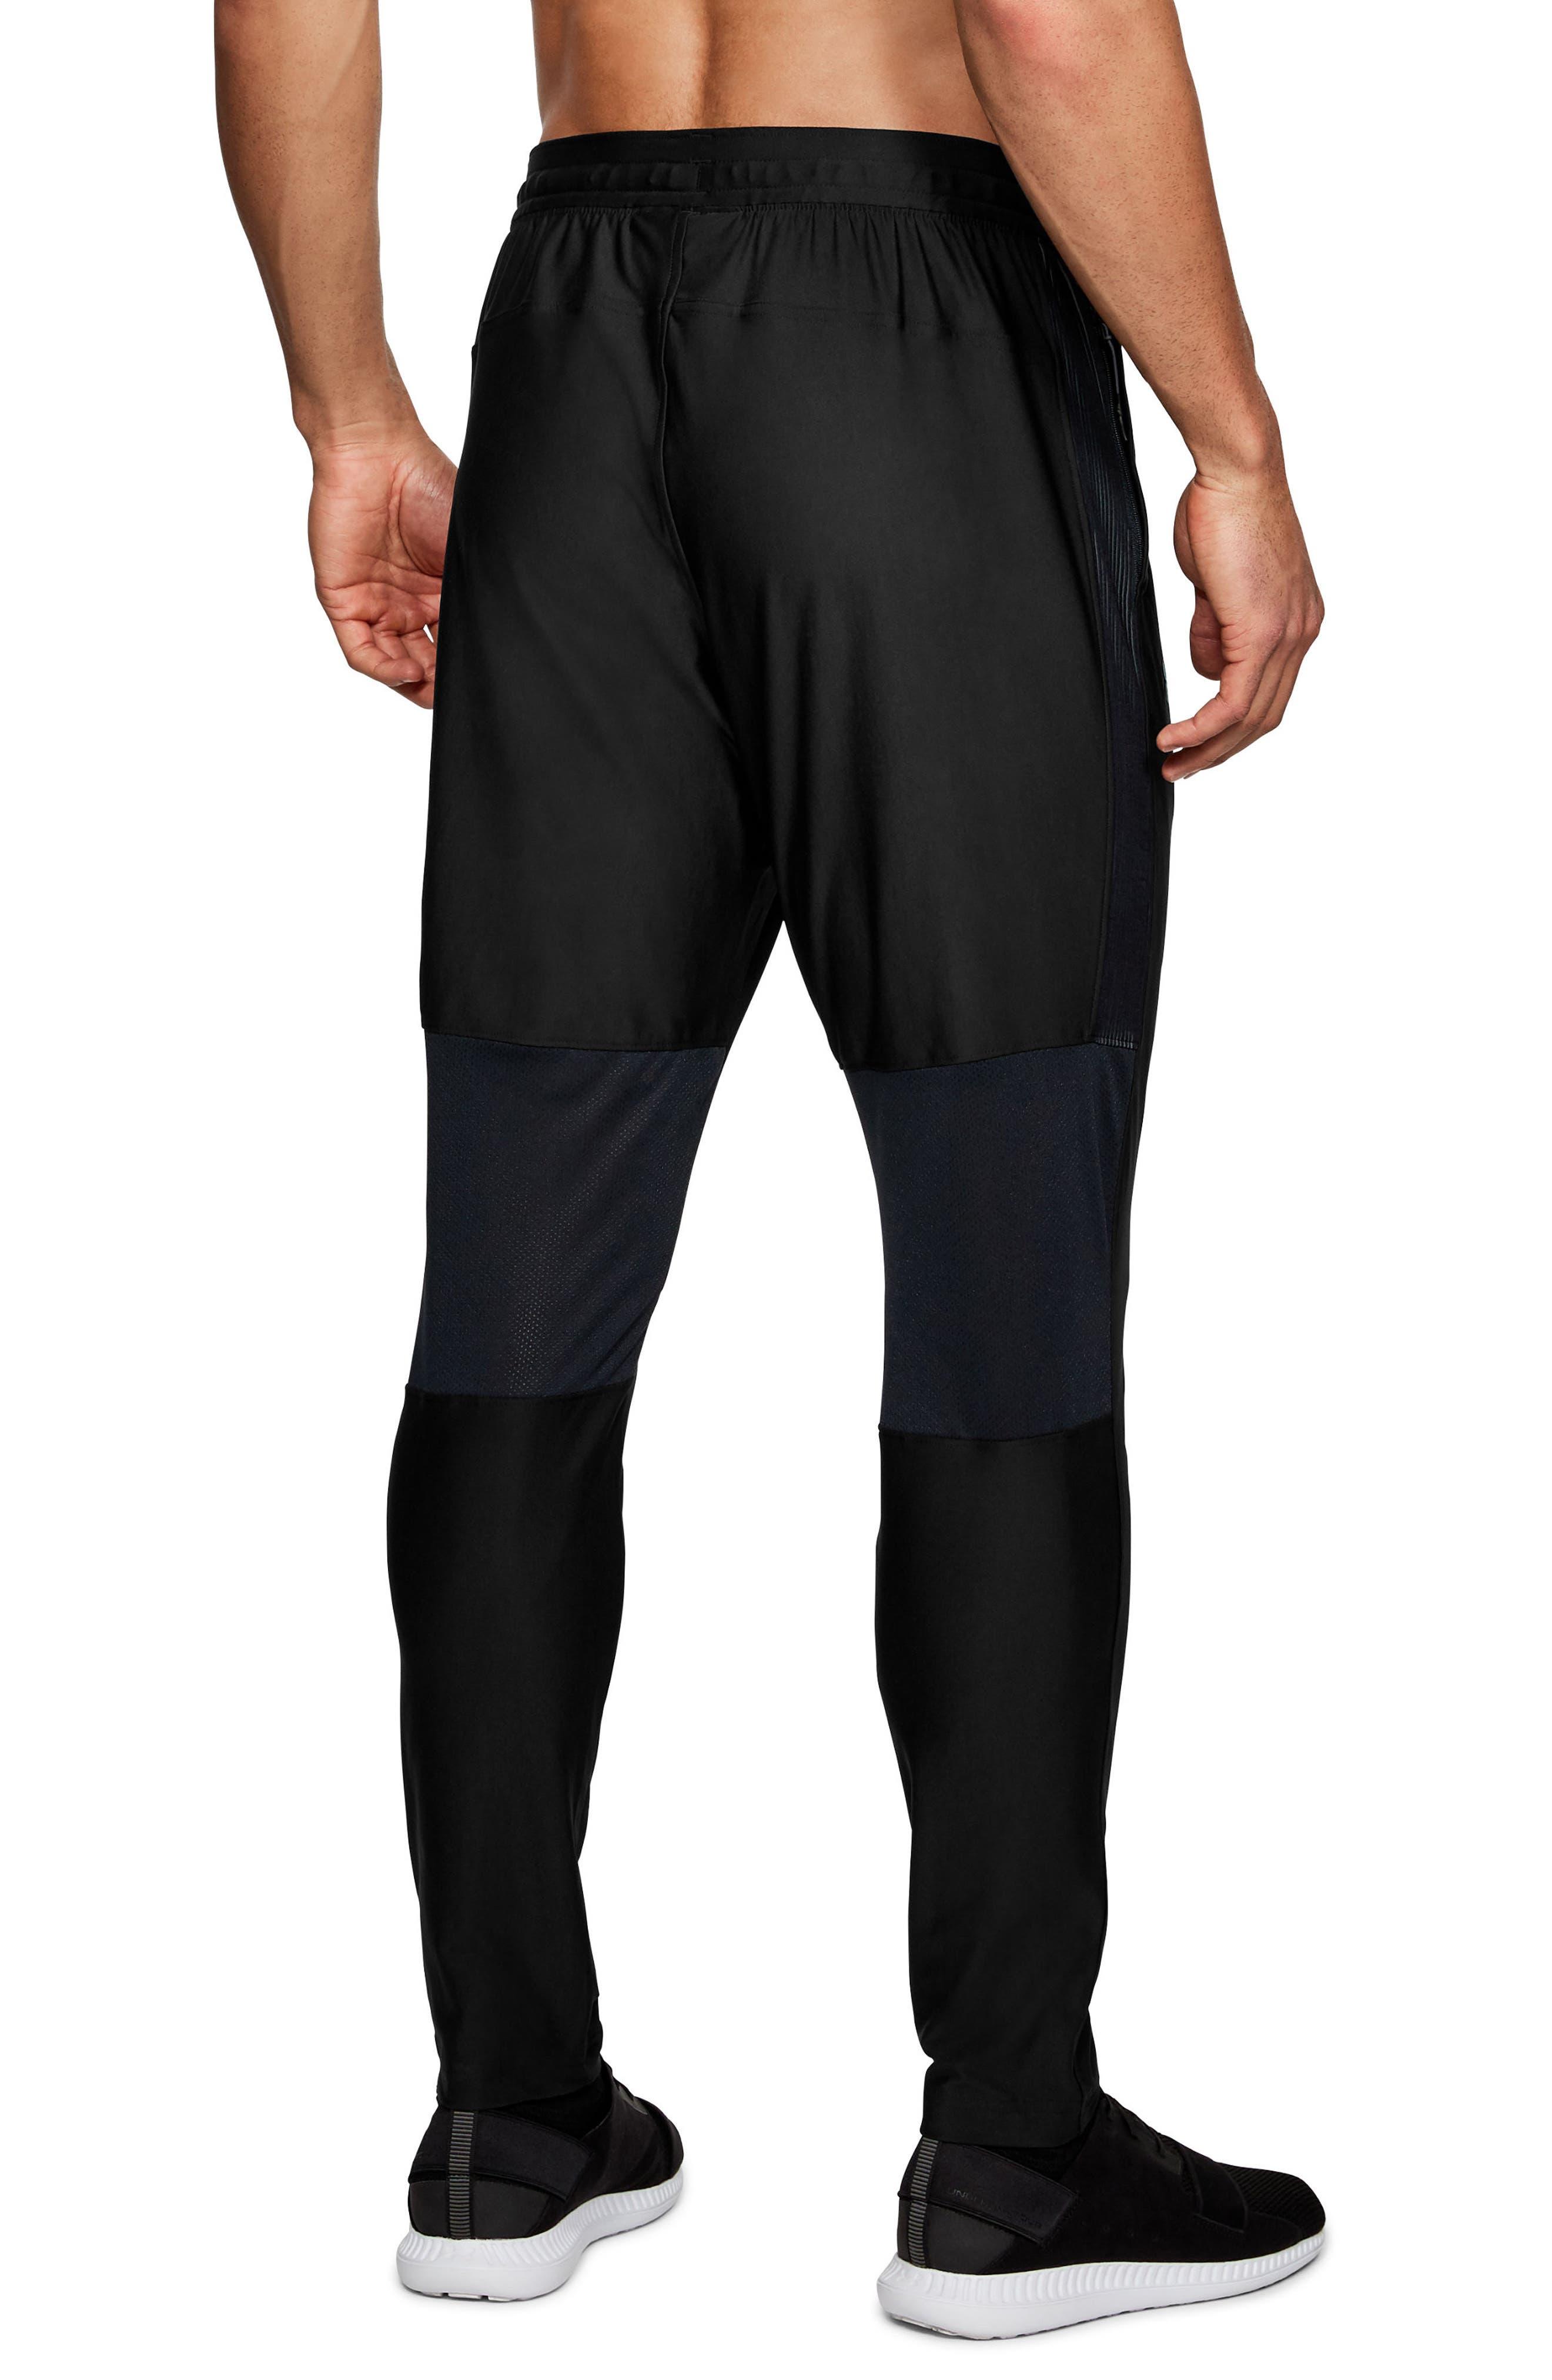 Threadborne Vanish Pants,                             Alternate thumbnail 2, color,                             001